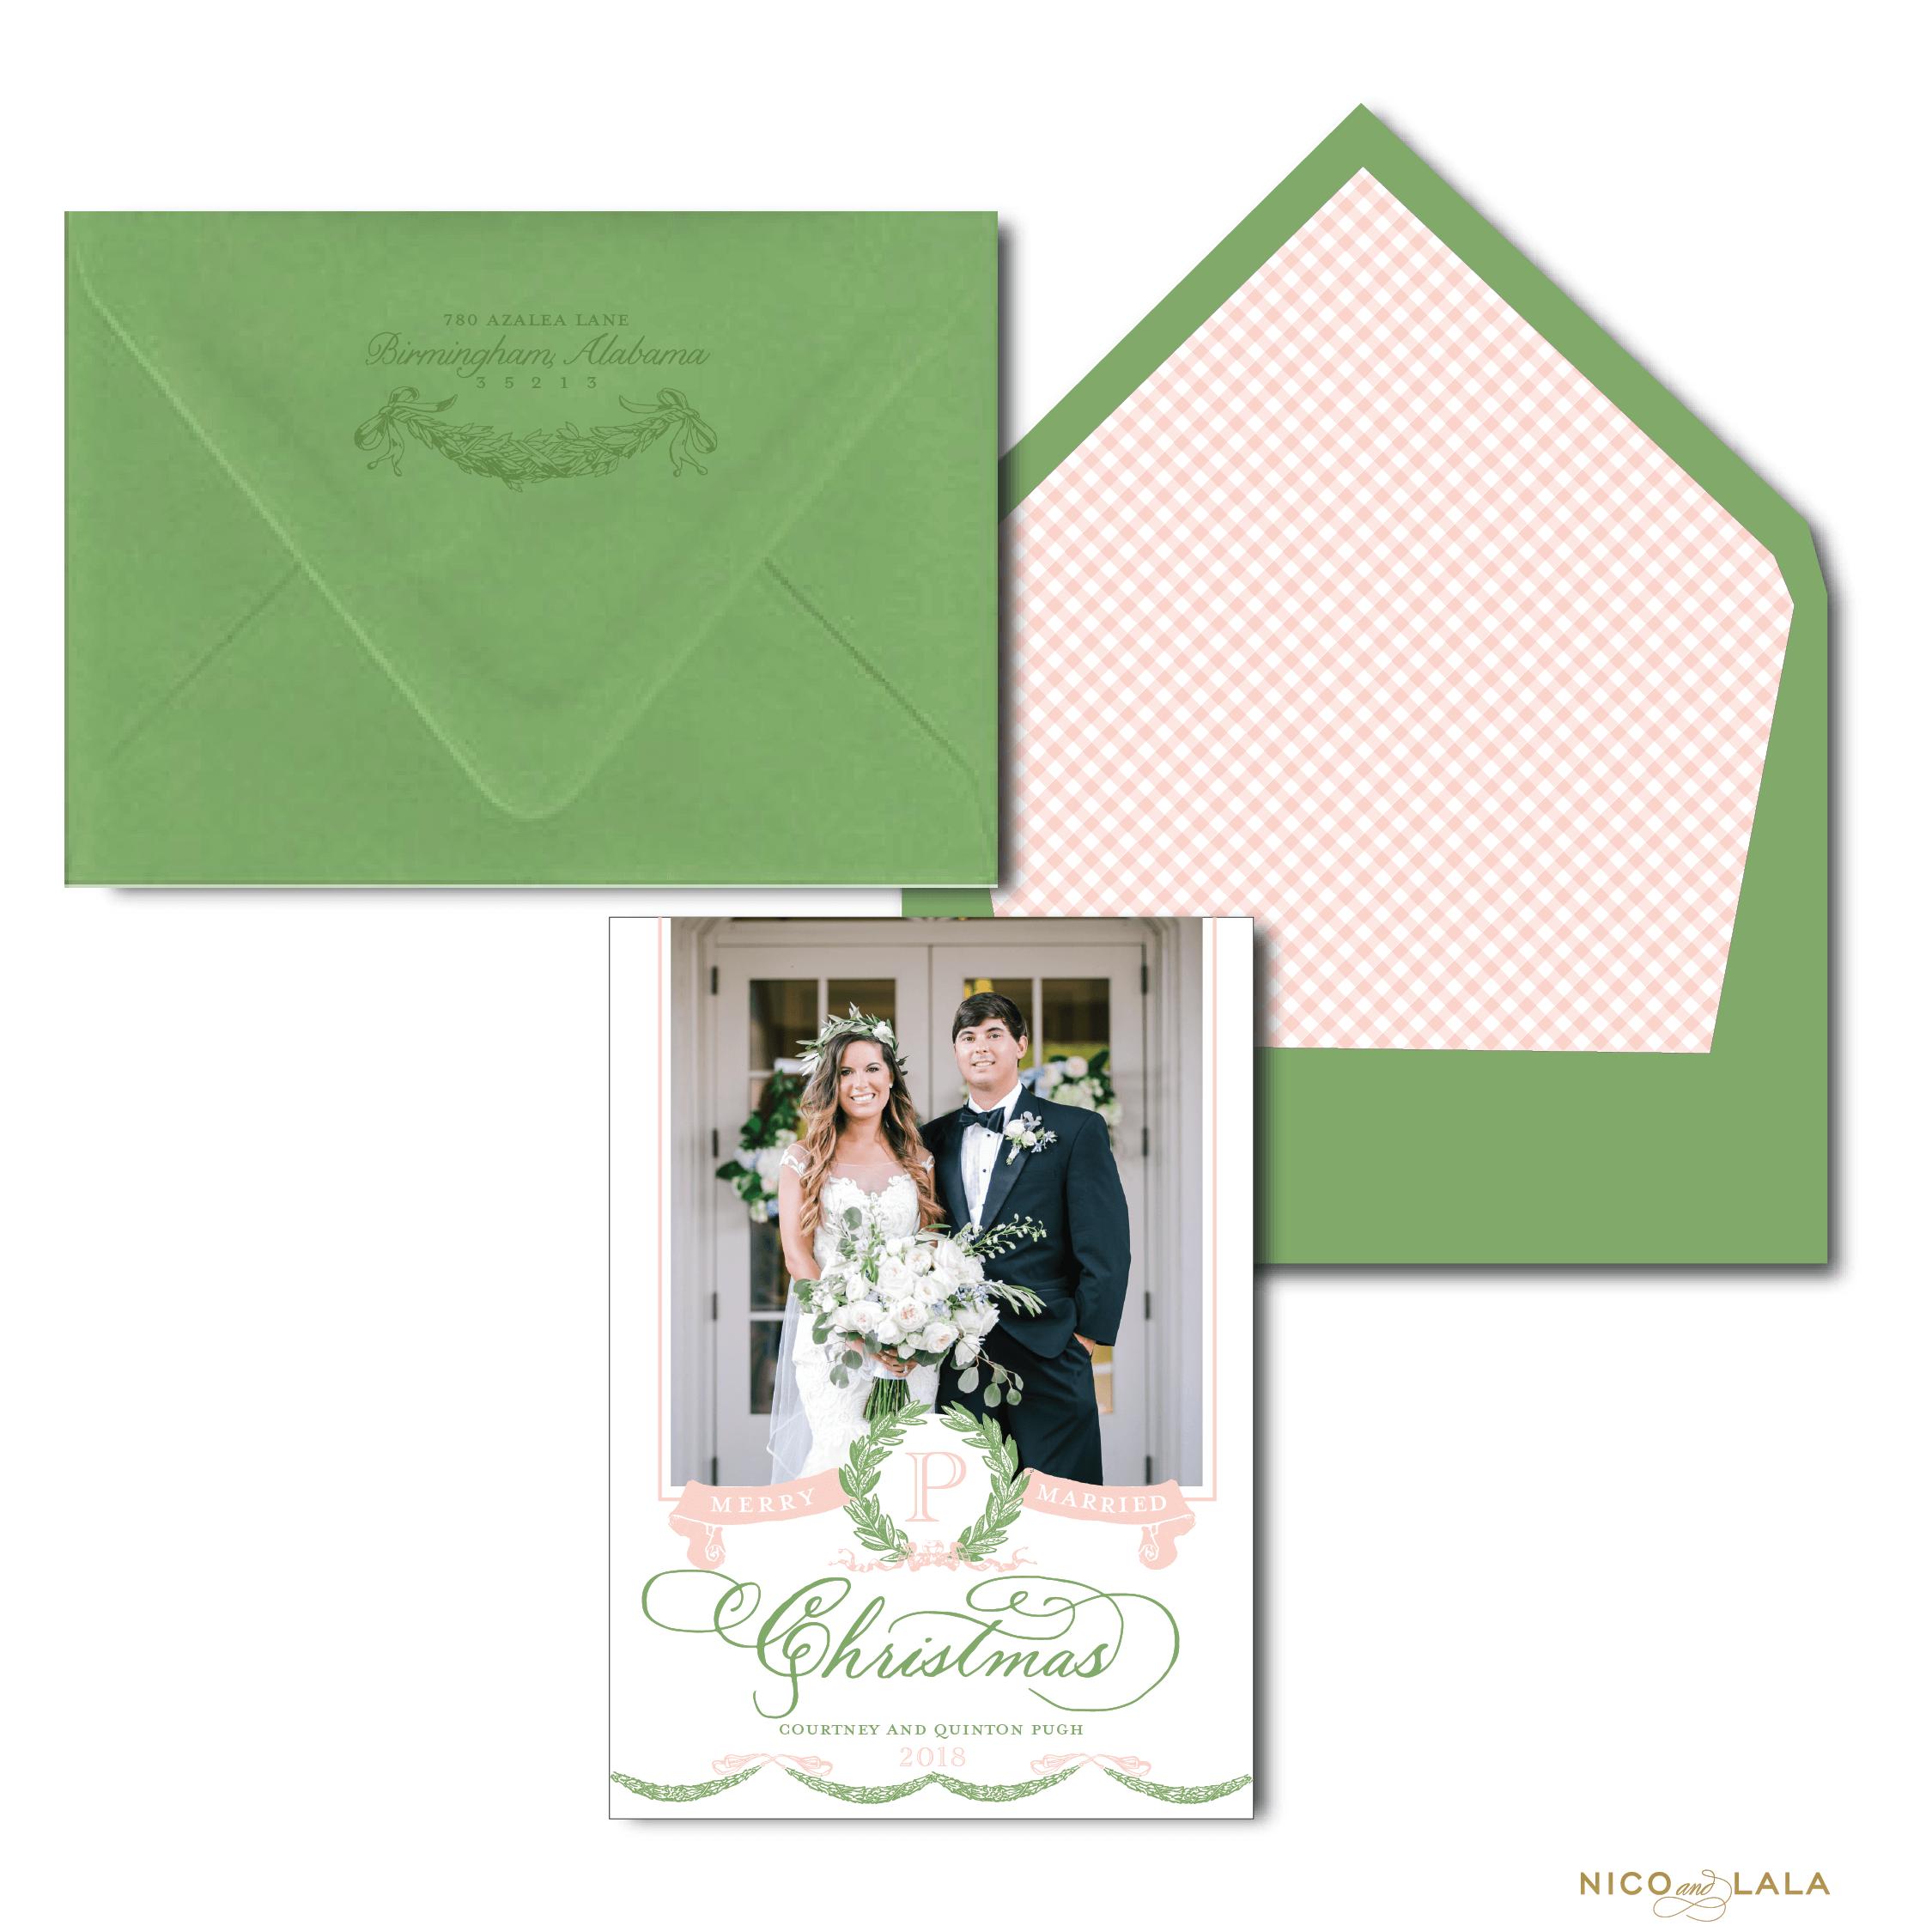 Merry Married Christmas Card ⋆ Nico and Lala